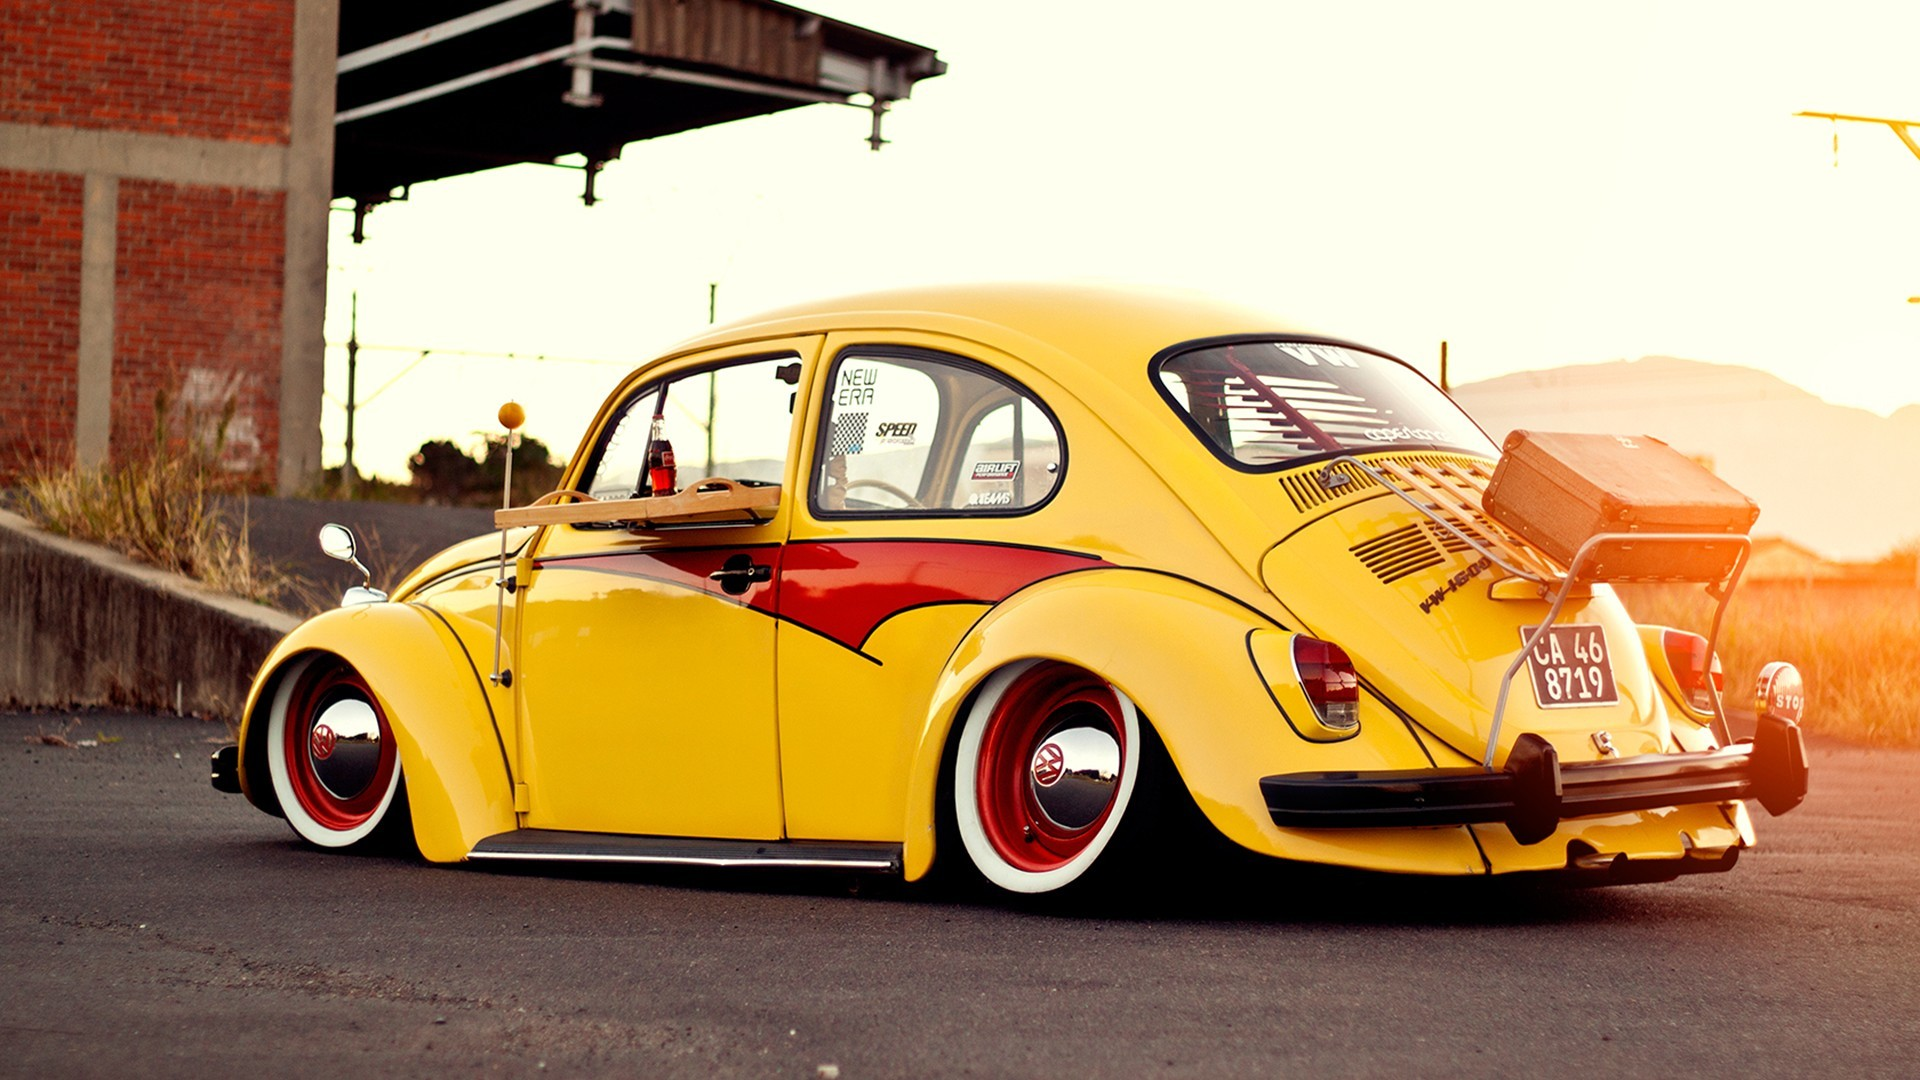 Volkswagen Beetle HD Wallpapers | Backgrounds – Wallpaper Abyss